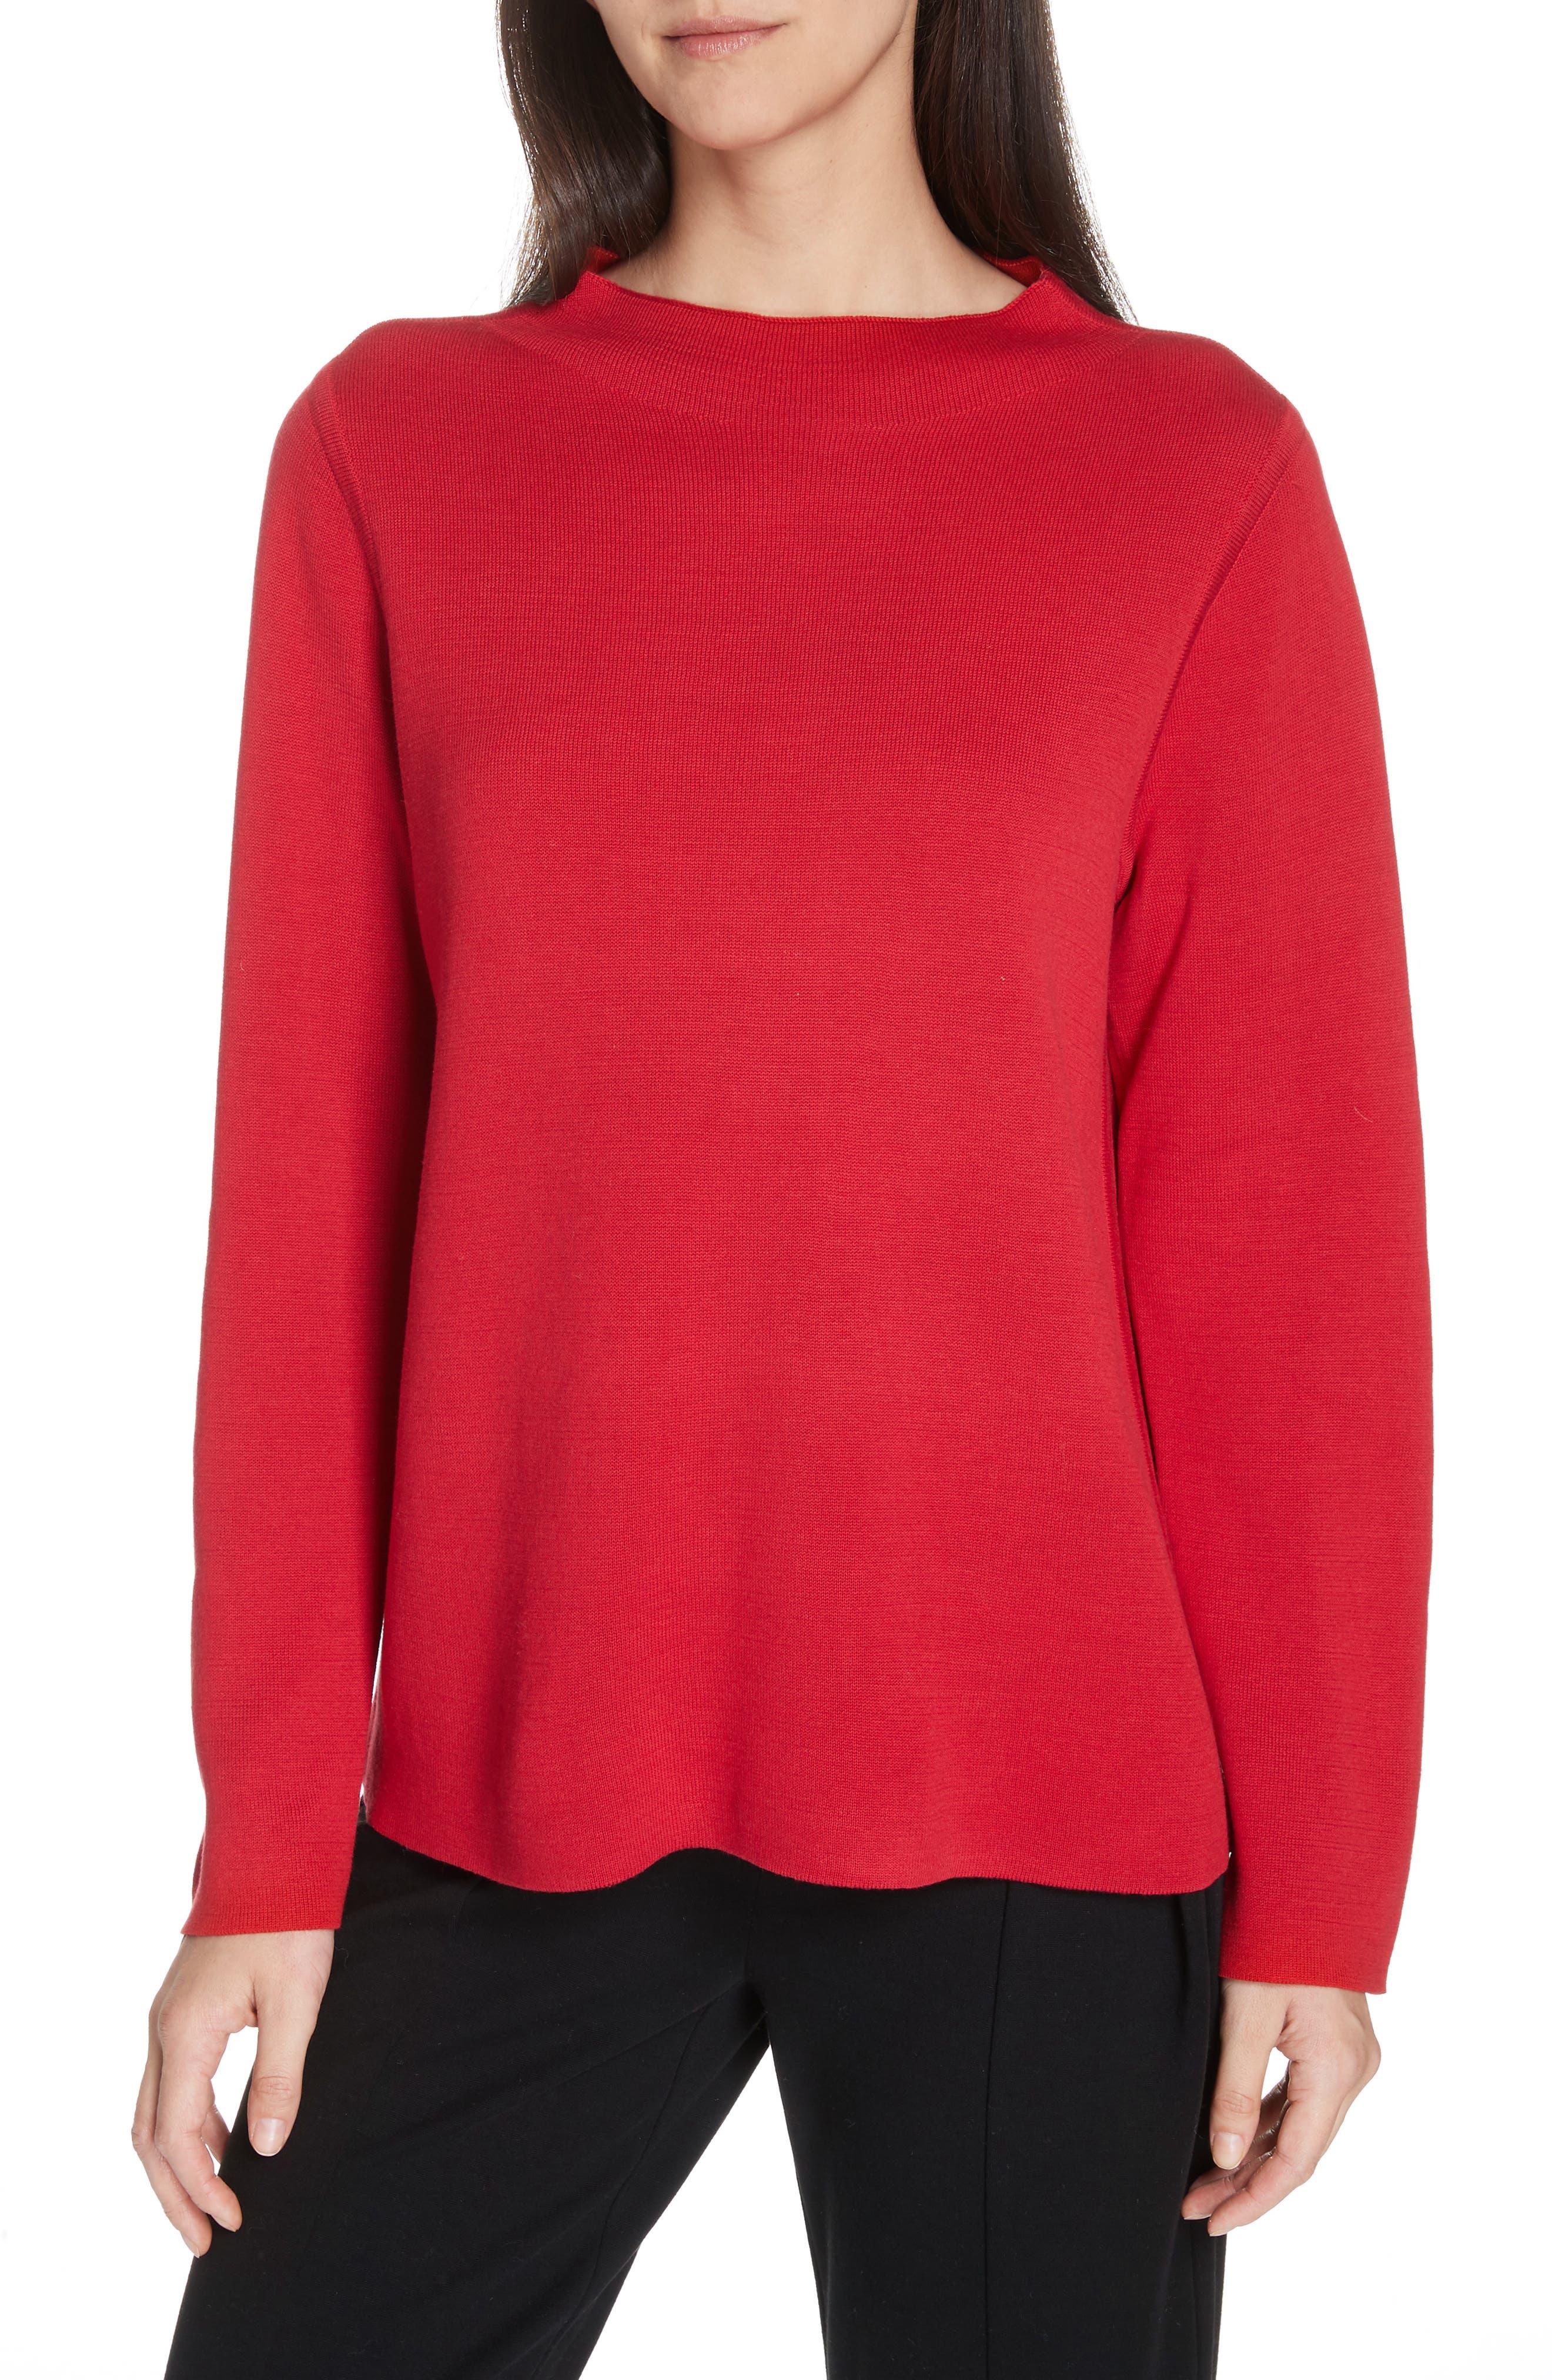 EILEEN FISHER, Reversilble Silk Blend Sweater, Main thumbnail 1, color, LACQUER